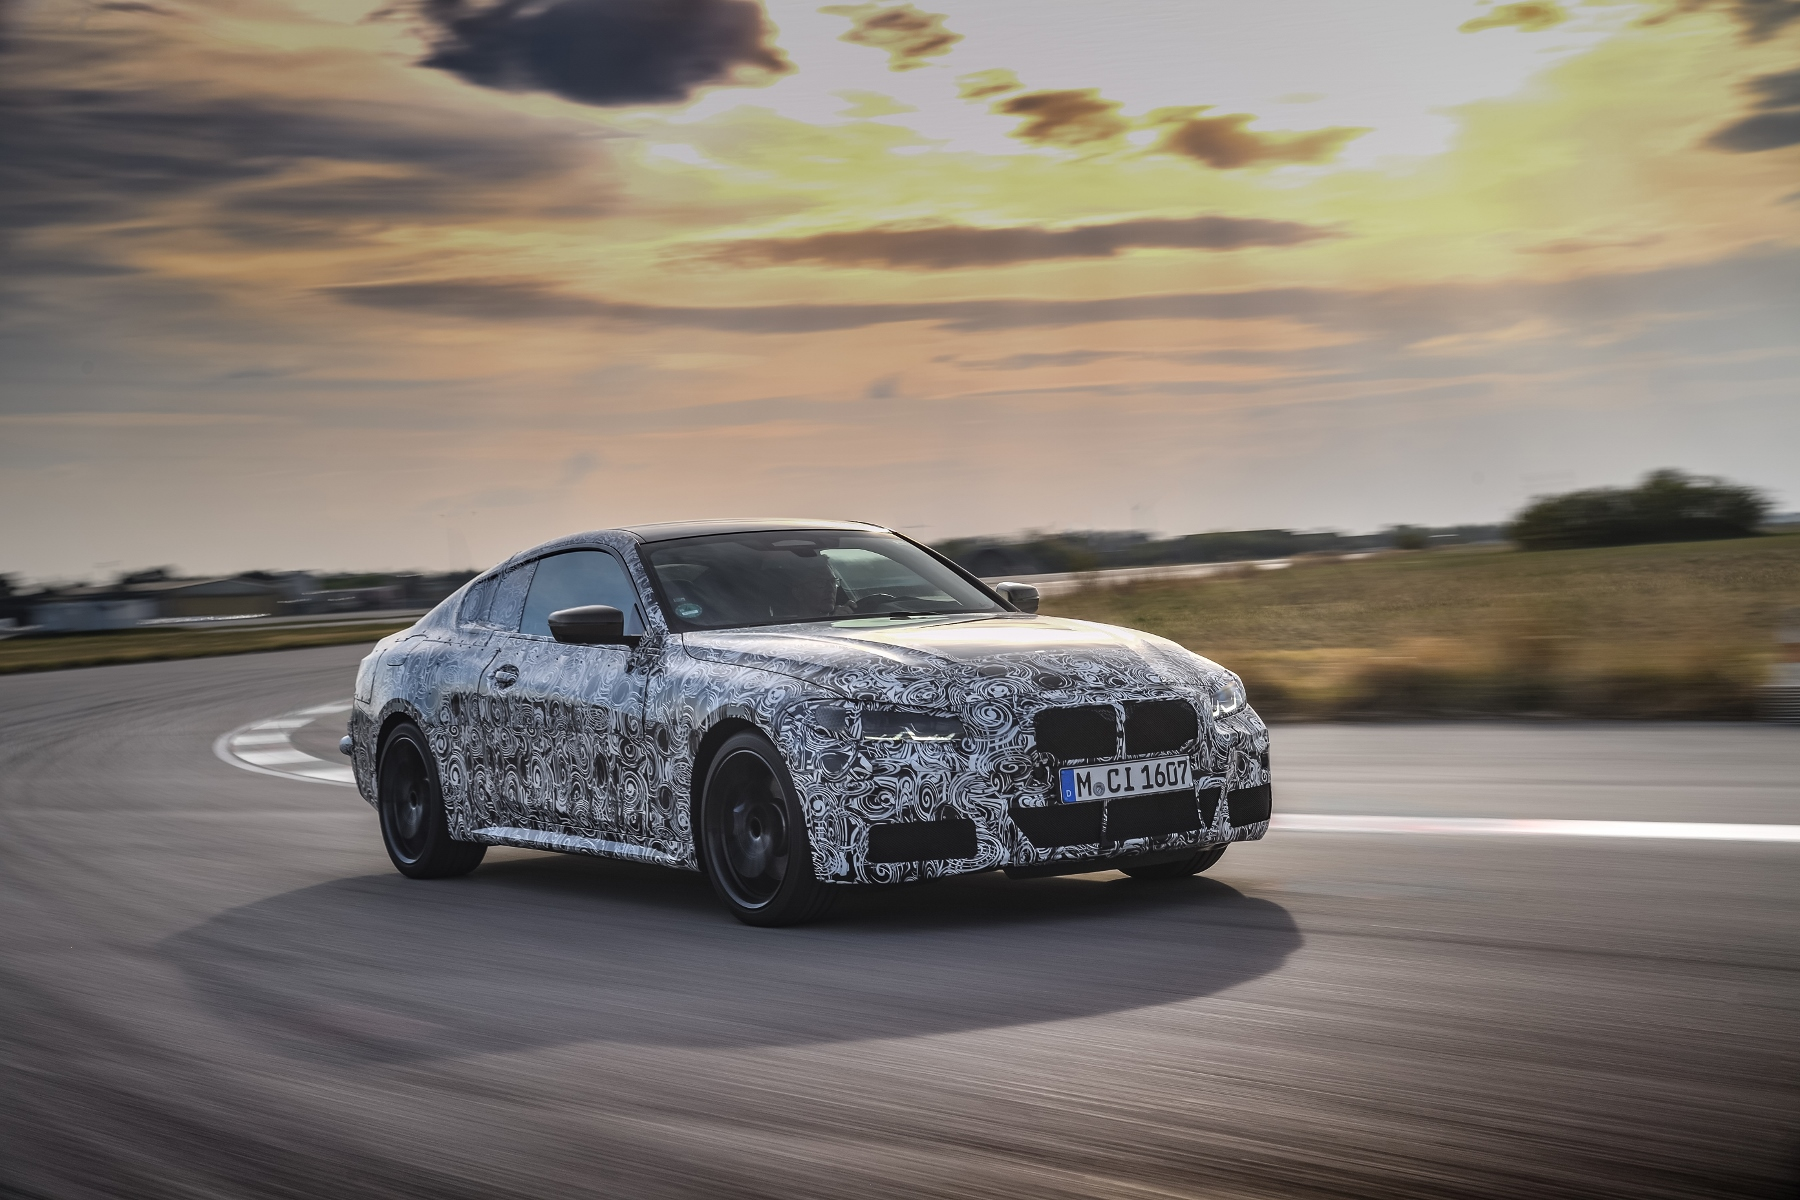 Nové BMW radu 4 Coupé dostane športovejší podvozok yD40xulDBs bmw-4-coupe-2